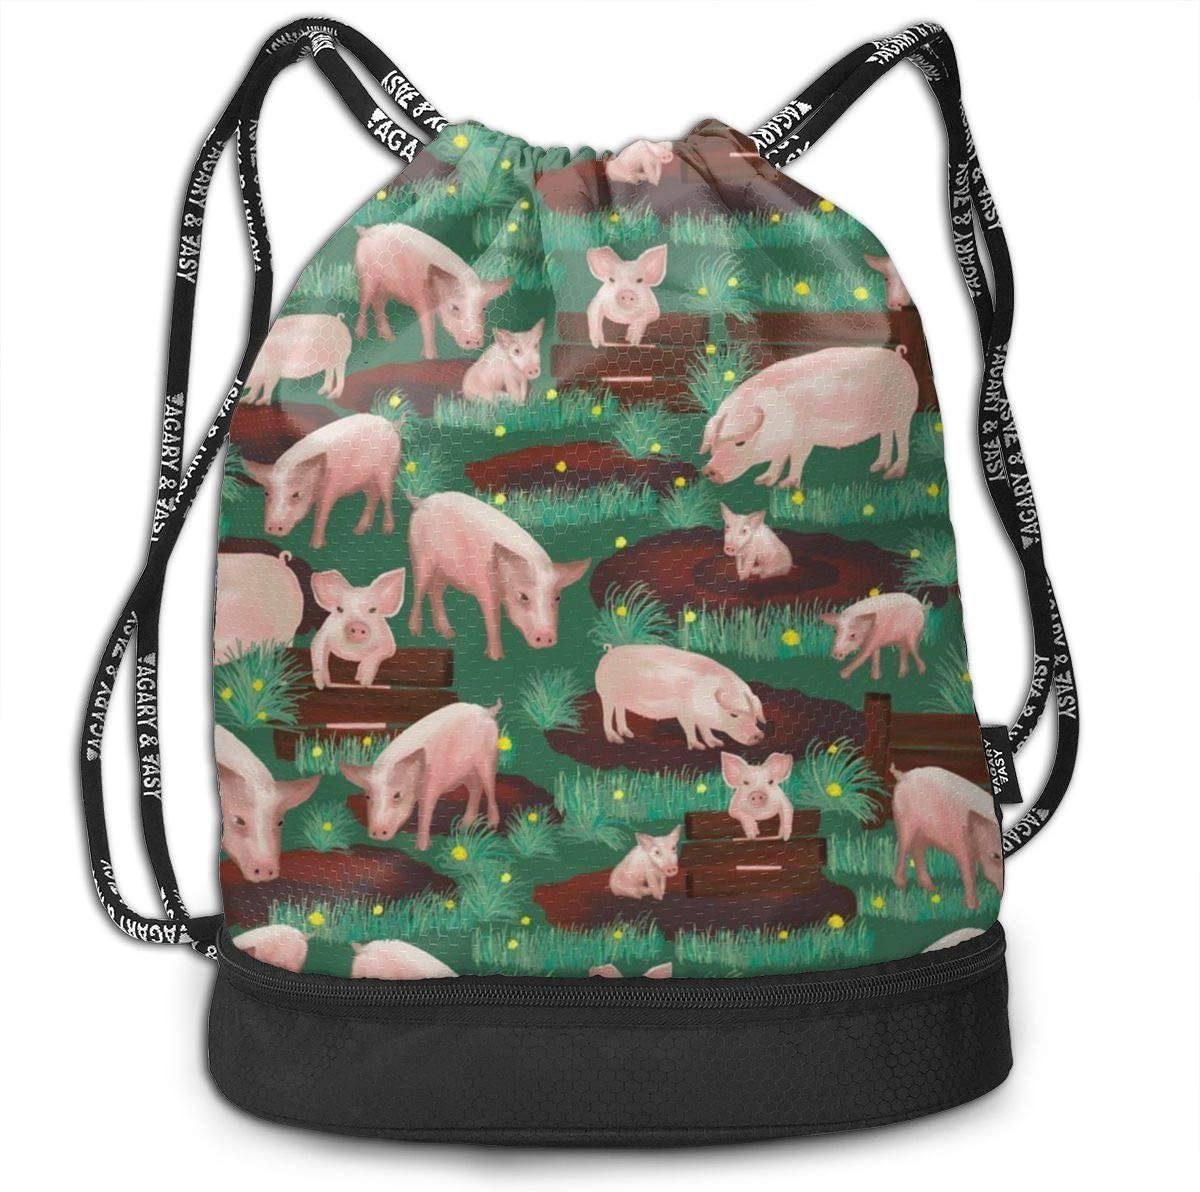 Lightweight Waterproof Large Storage Drawstring Bag For Men /& Women Pigs In Farm Cinch Backpack Sackpack Tote Sack